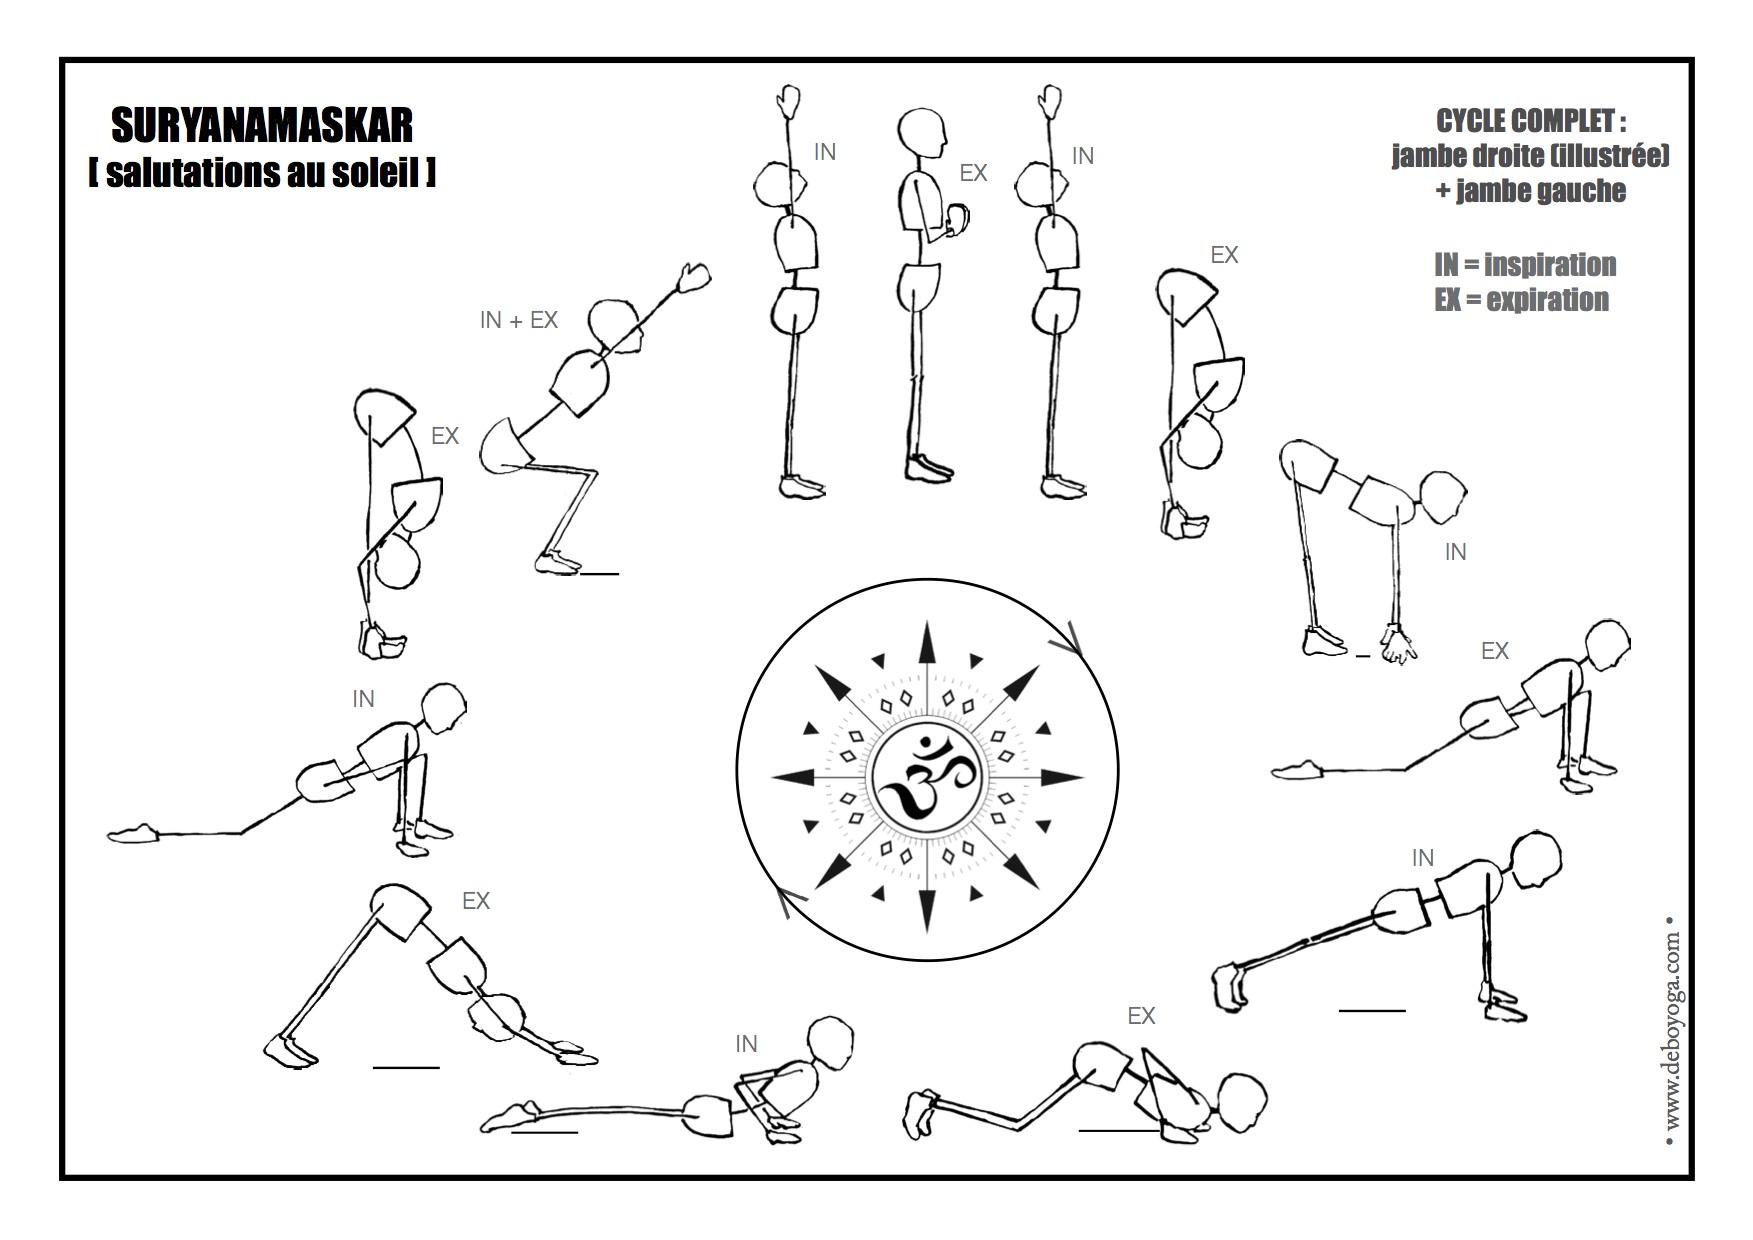 Om shanti ! suryanamaskar deboyoga. La pratique du yoga ... 6bbb0417ed3